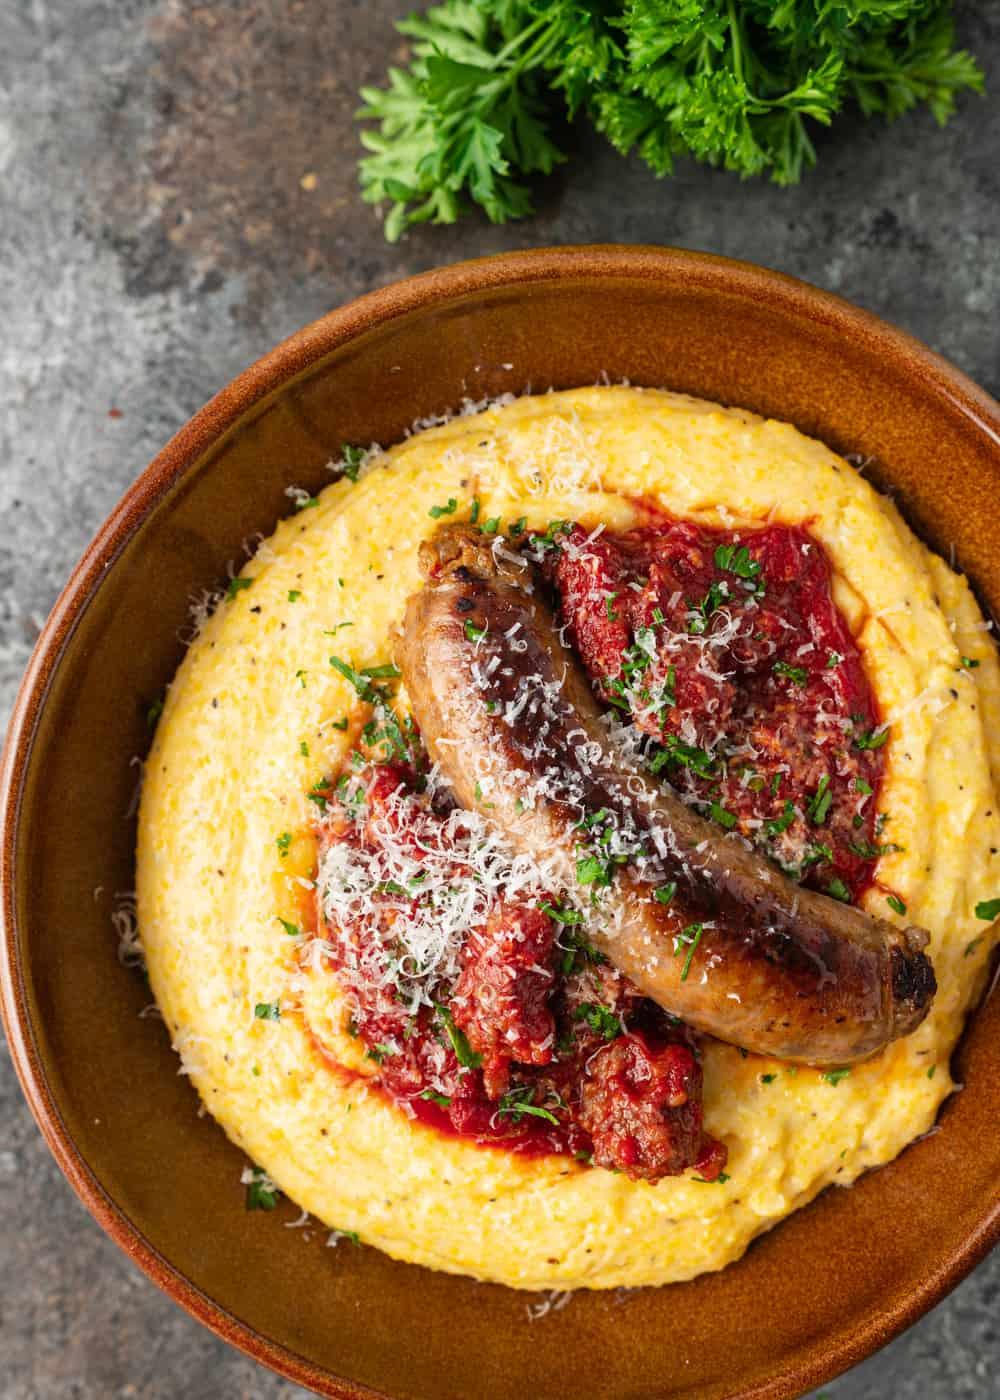 overhead image: sausage link on top of creamy polenta with ragu sauce